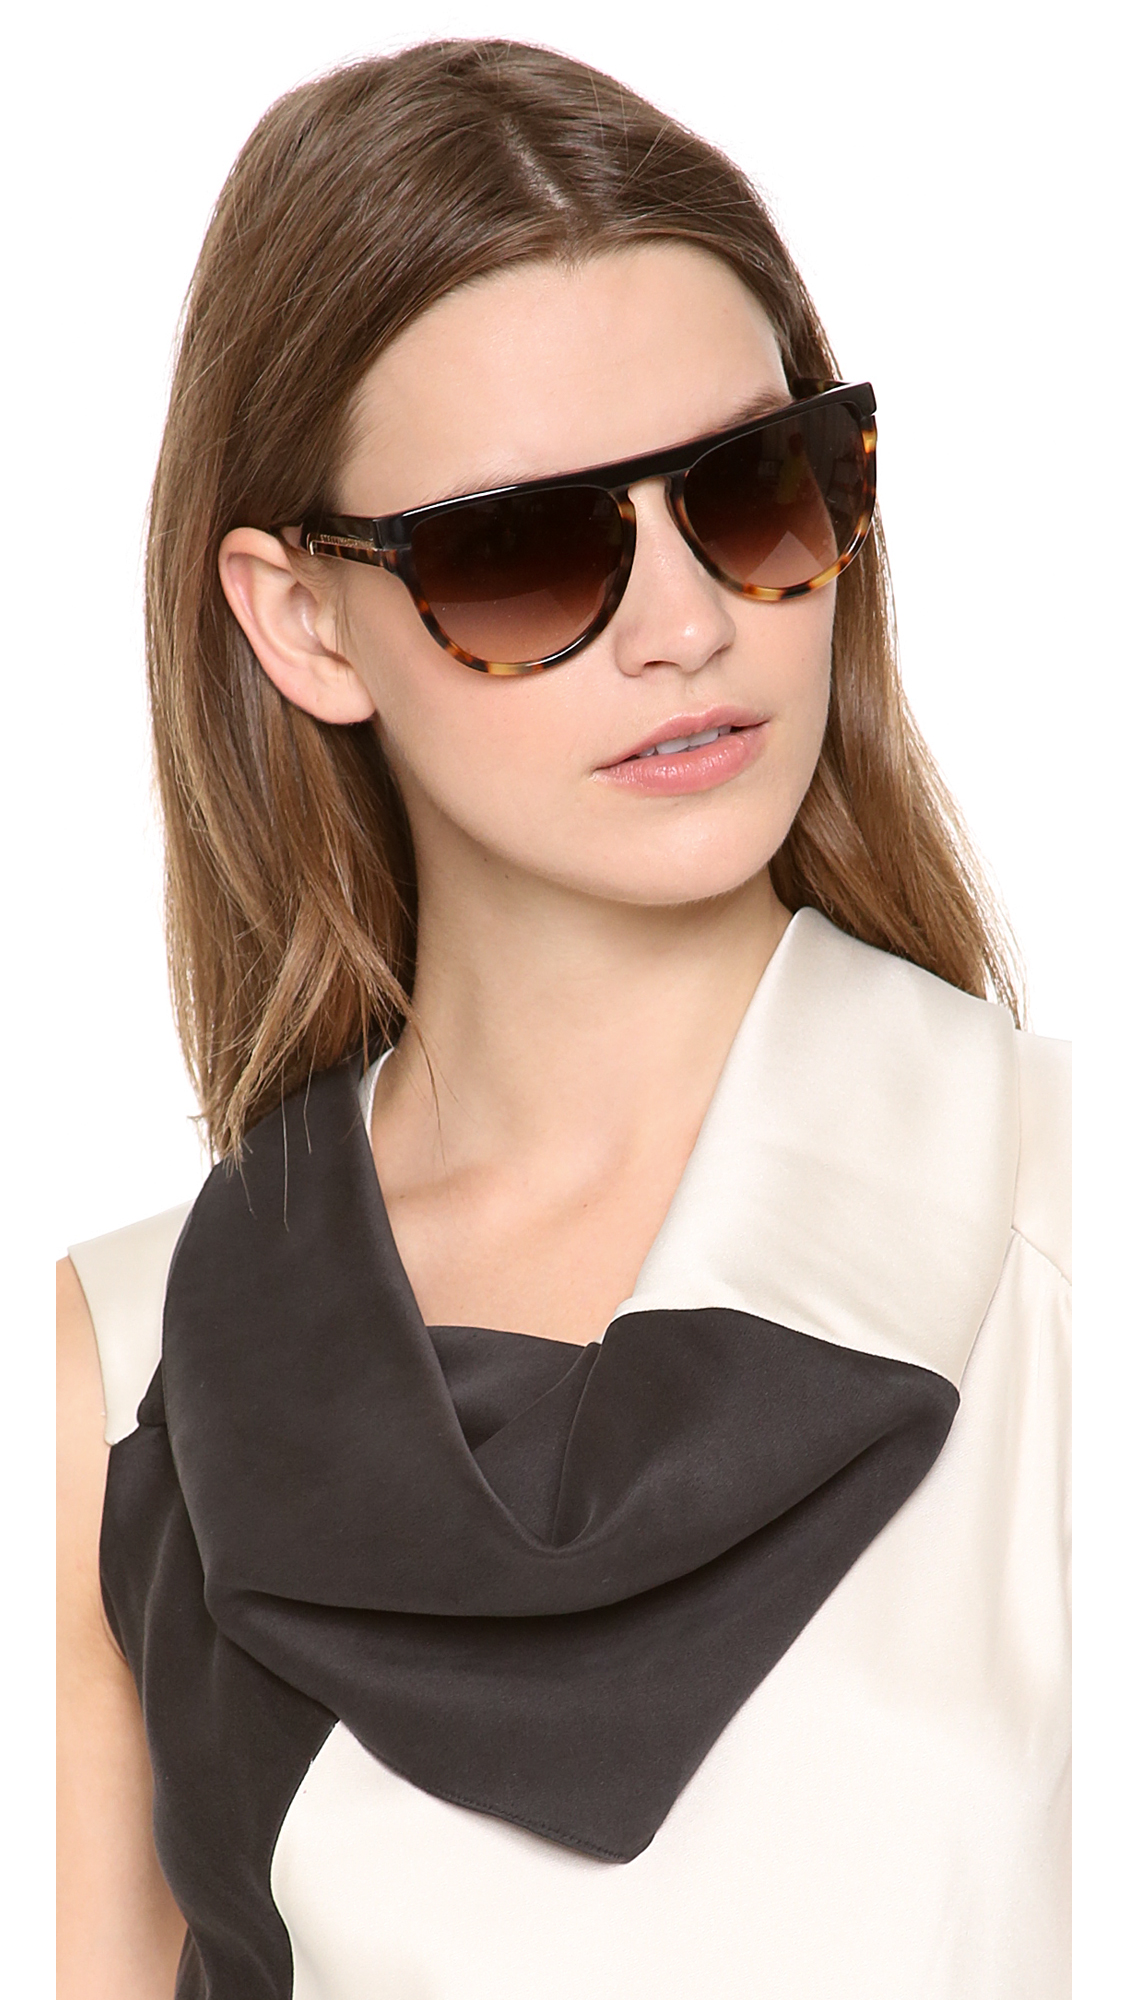 2b4868f47 Stella McCartney Flat Top Oversized Sunglasses - Top Black/Grey ...